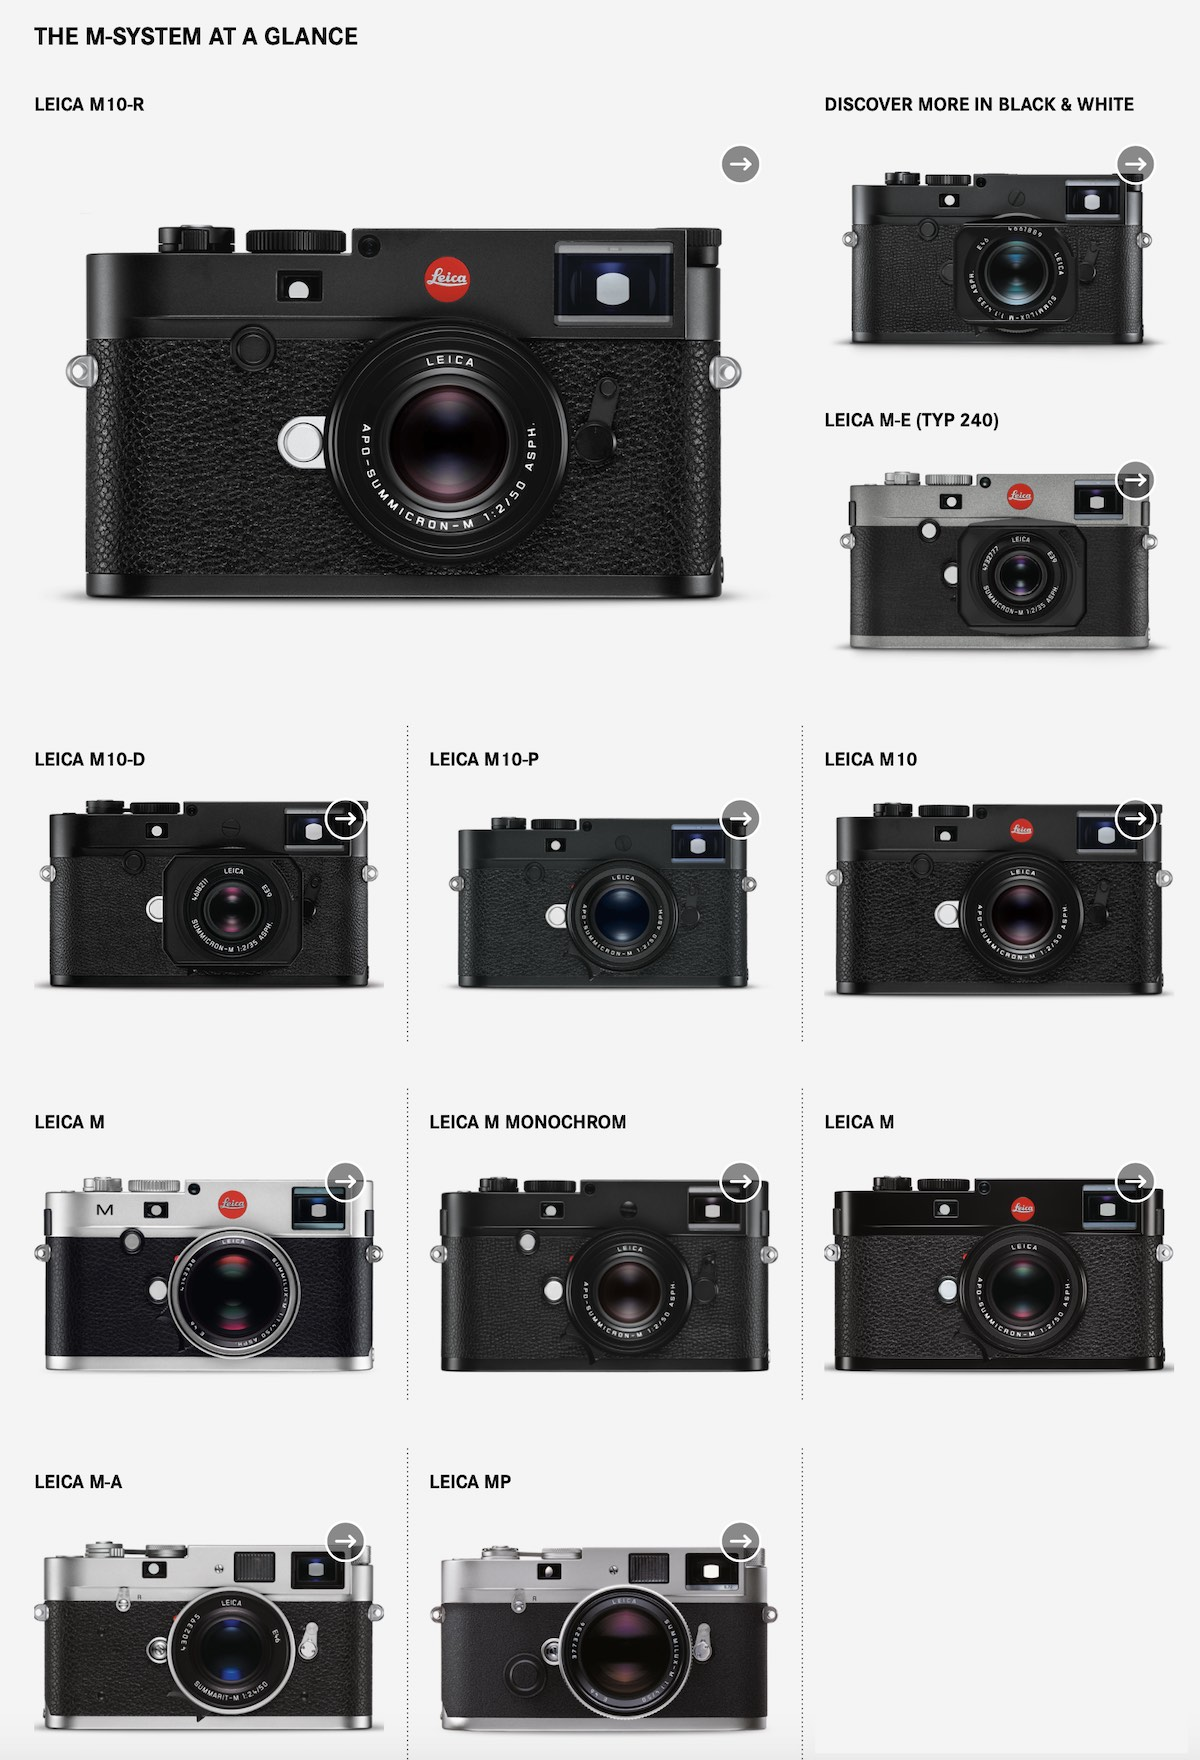 Leica M10 and Leica M10-D cameras discontinued - Leica Rumors